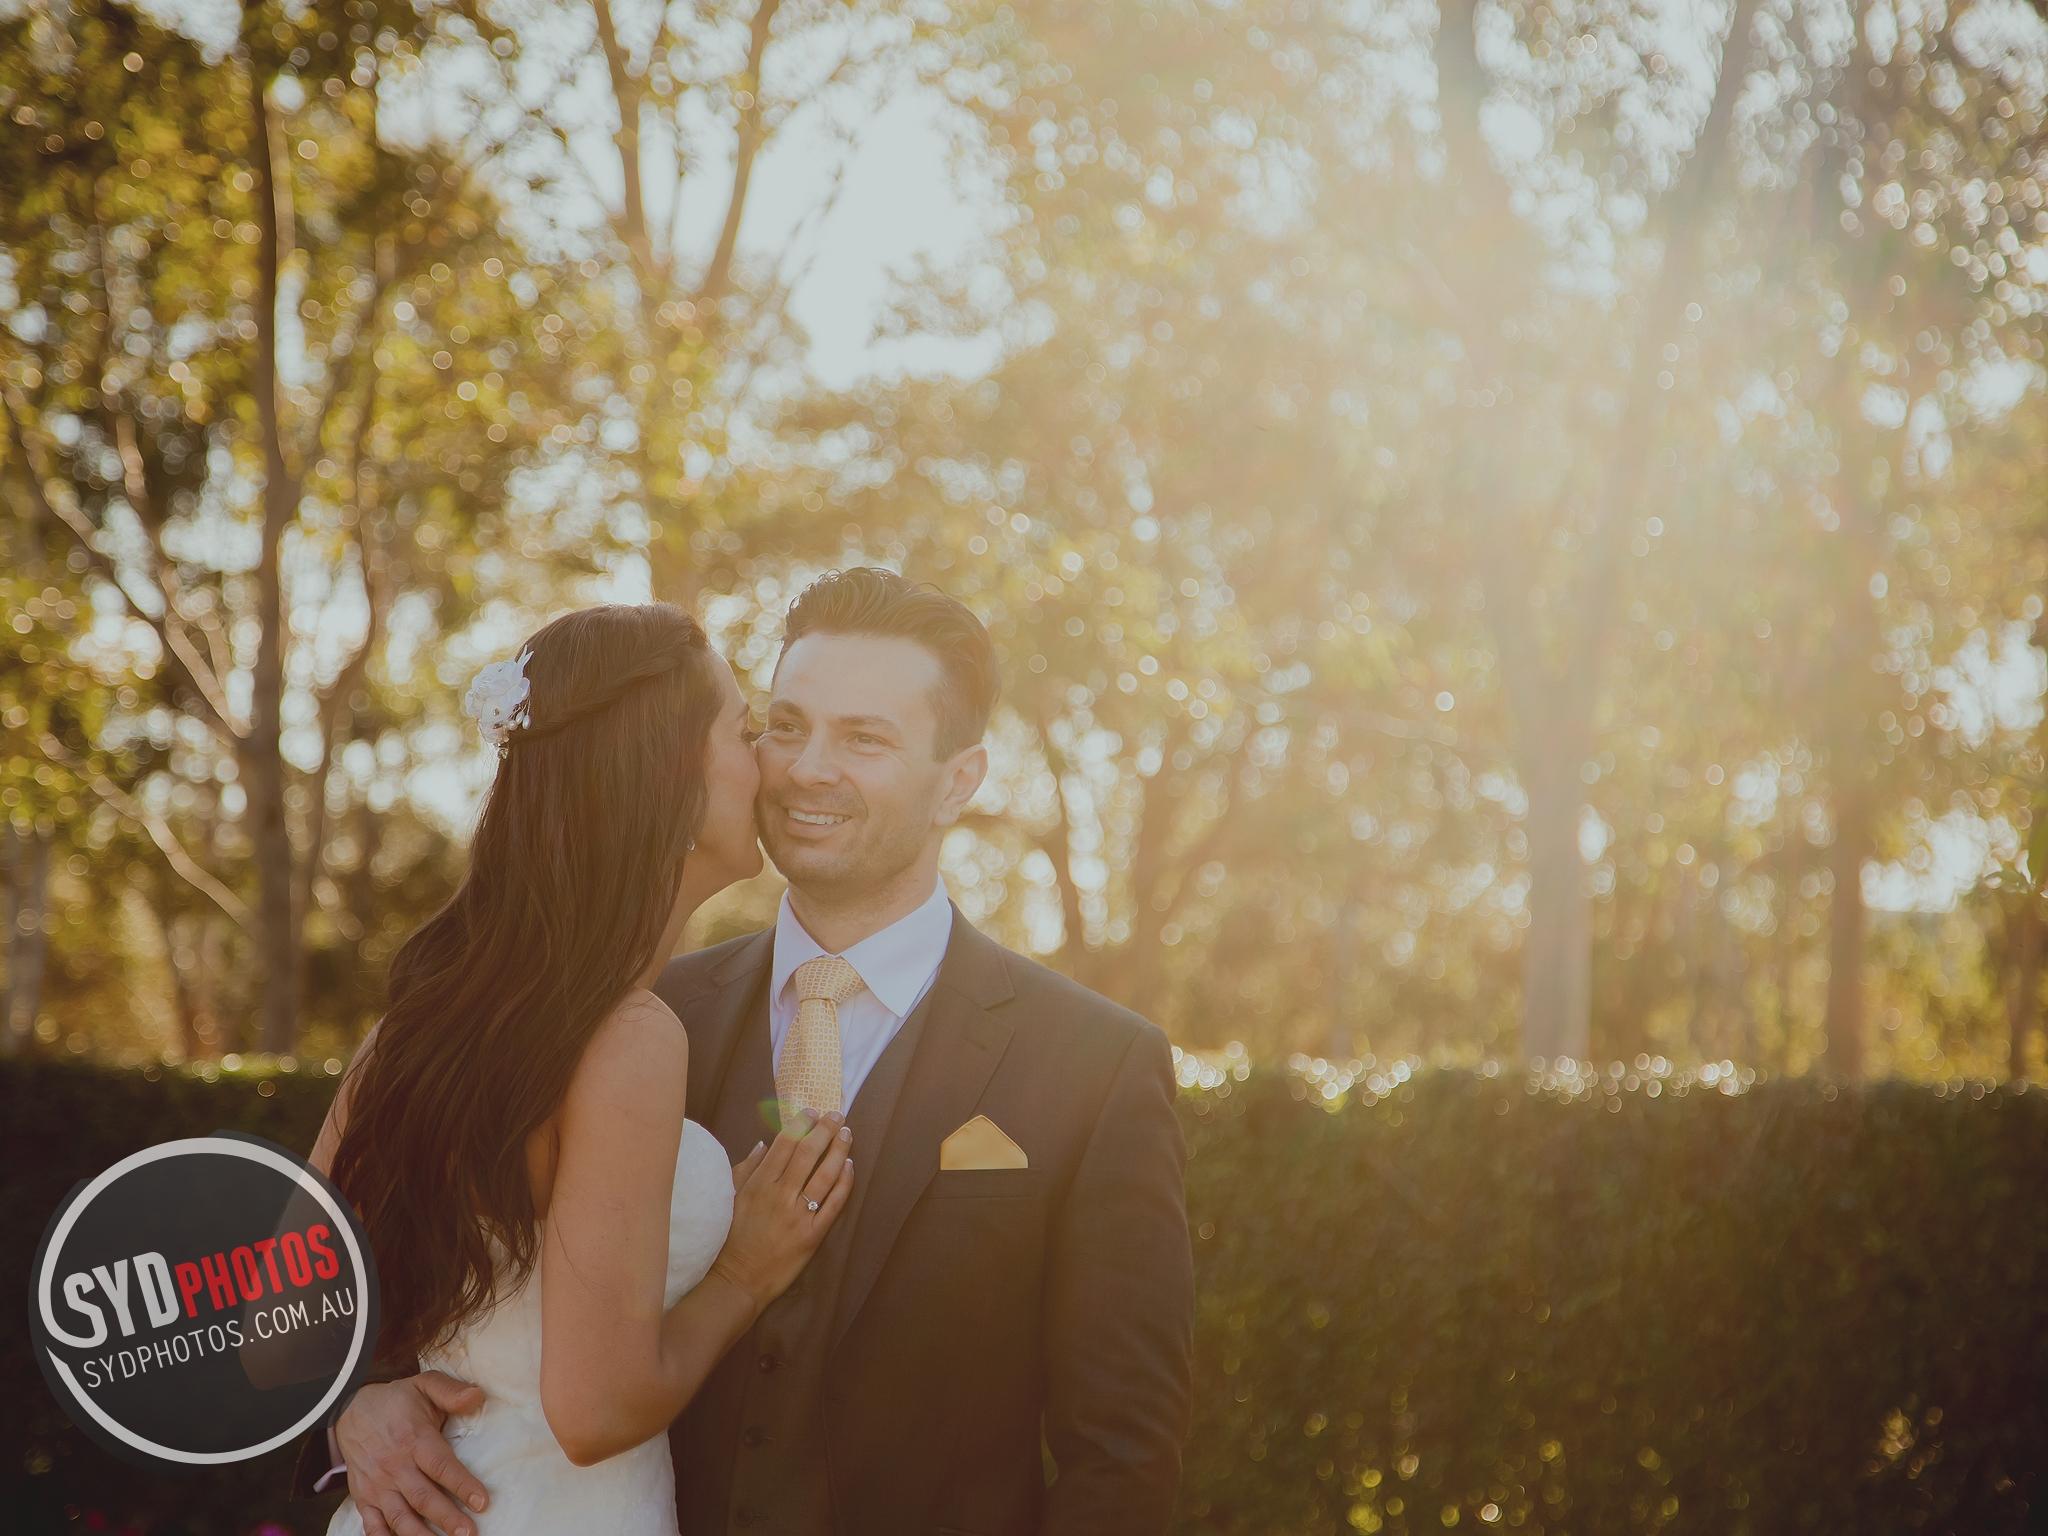 ID-110470-Lara-Prewedding-悉尼婚纱摄影